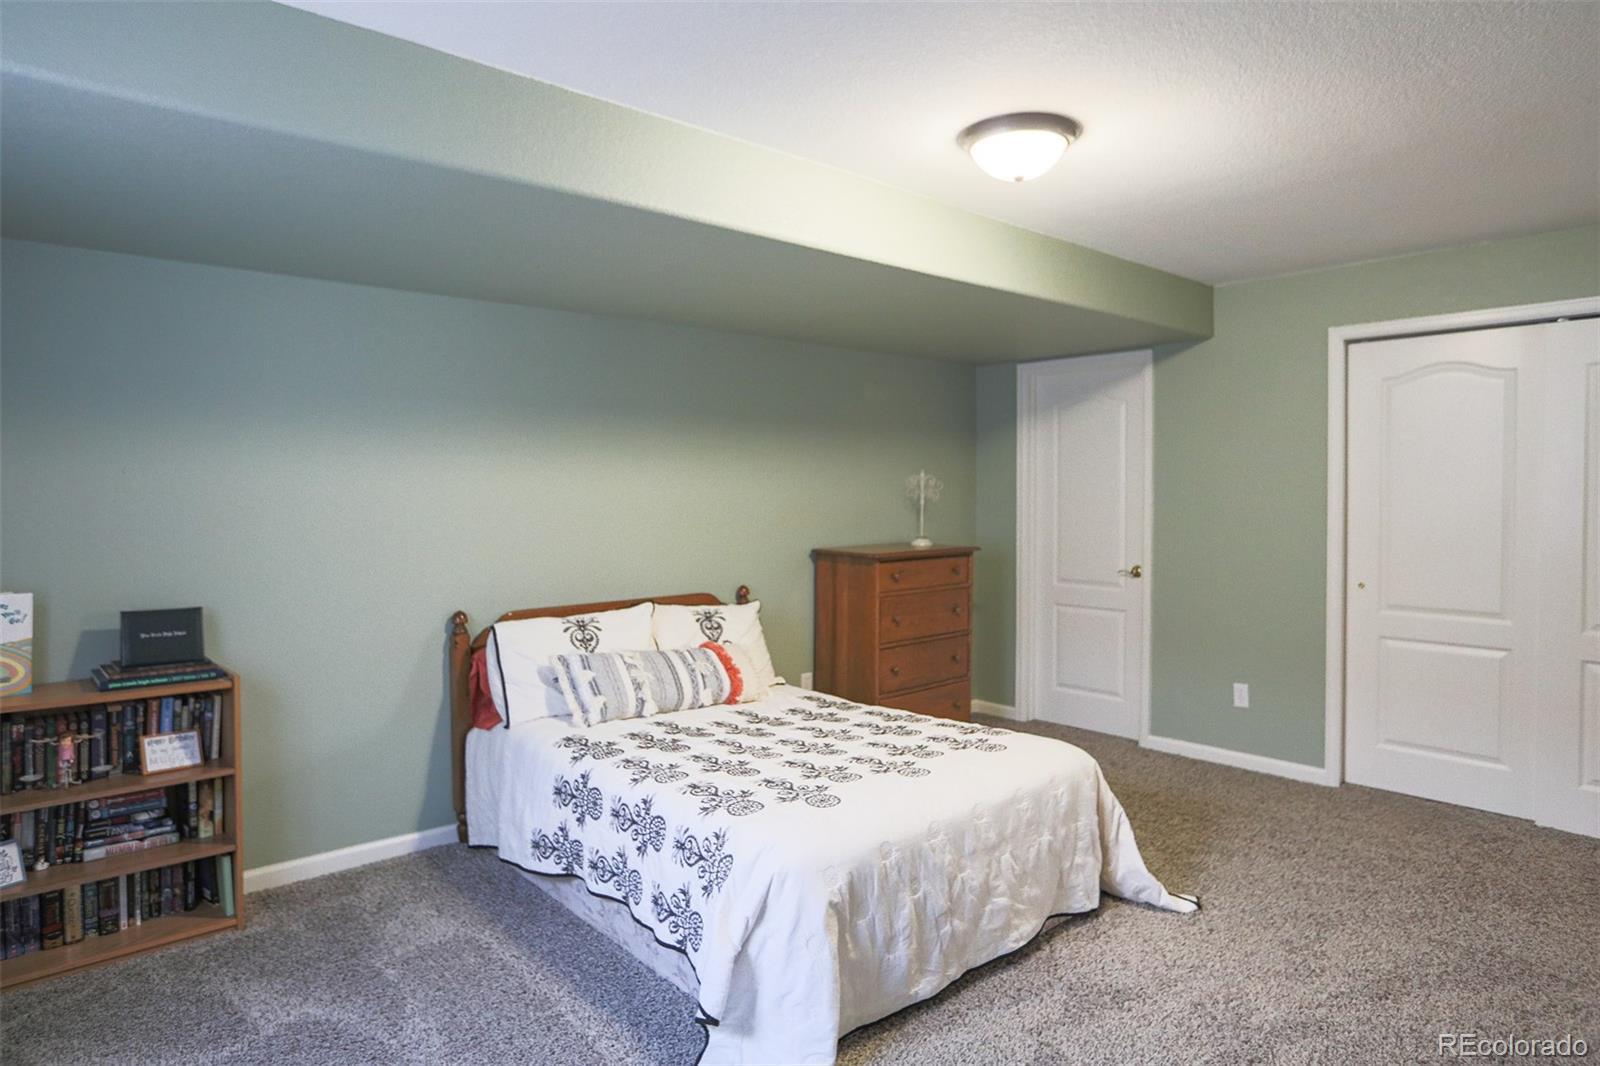 MLS# 5205820 - 28 - 3325 Hollycrest Drive, Colorado Springs, CO 80920